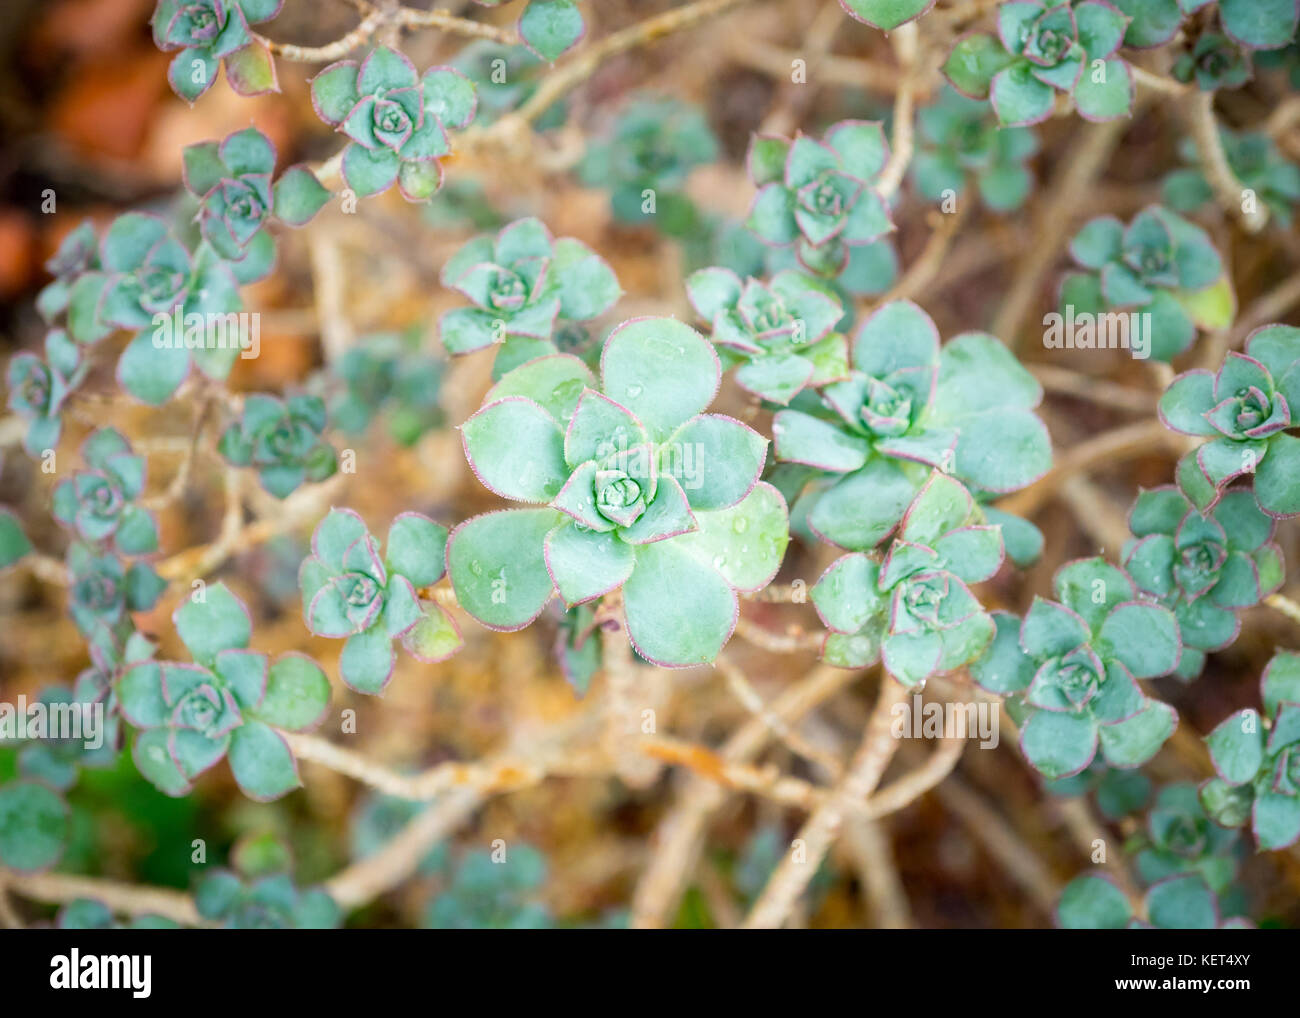 Aeonium haworthii 'Kiwi' (Aeonium Kiwi Pinwheel) succulent plant at the Muttart Conservatory in Edmonton, - Stock Image